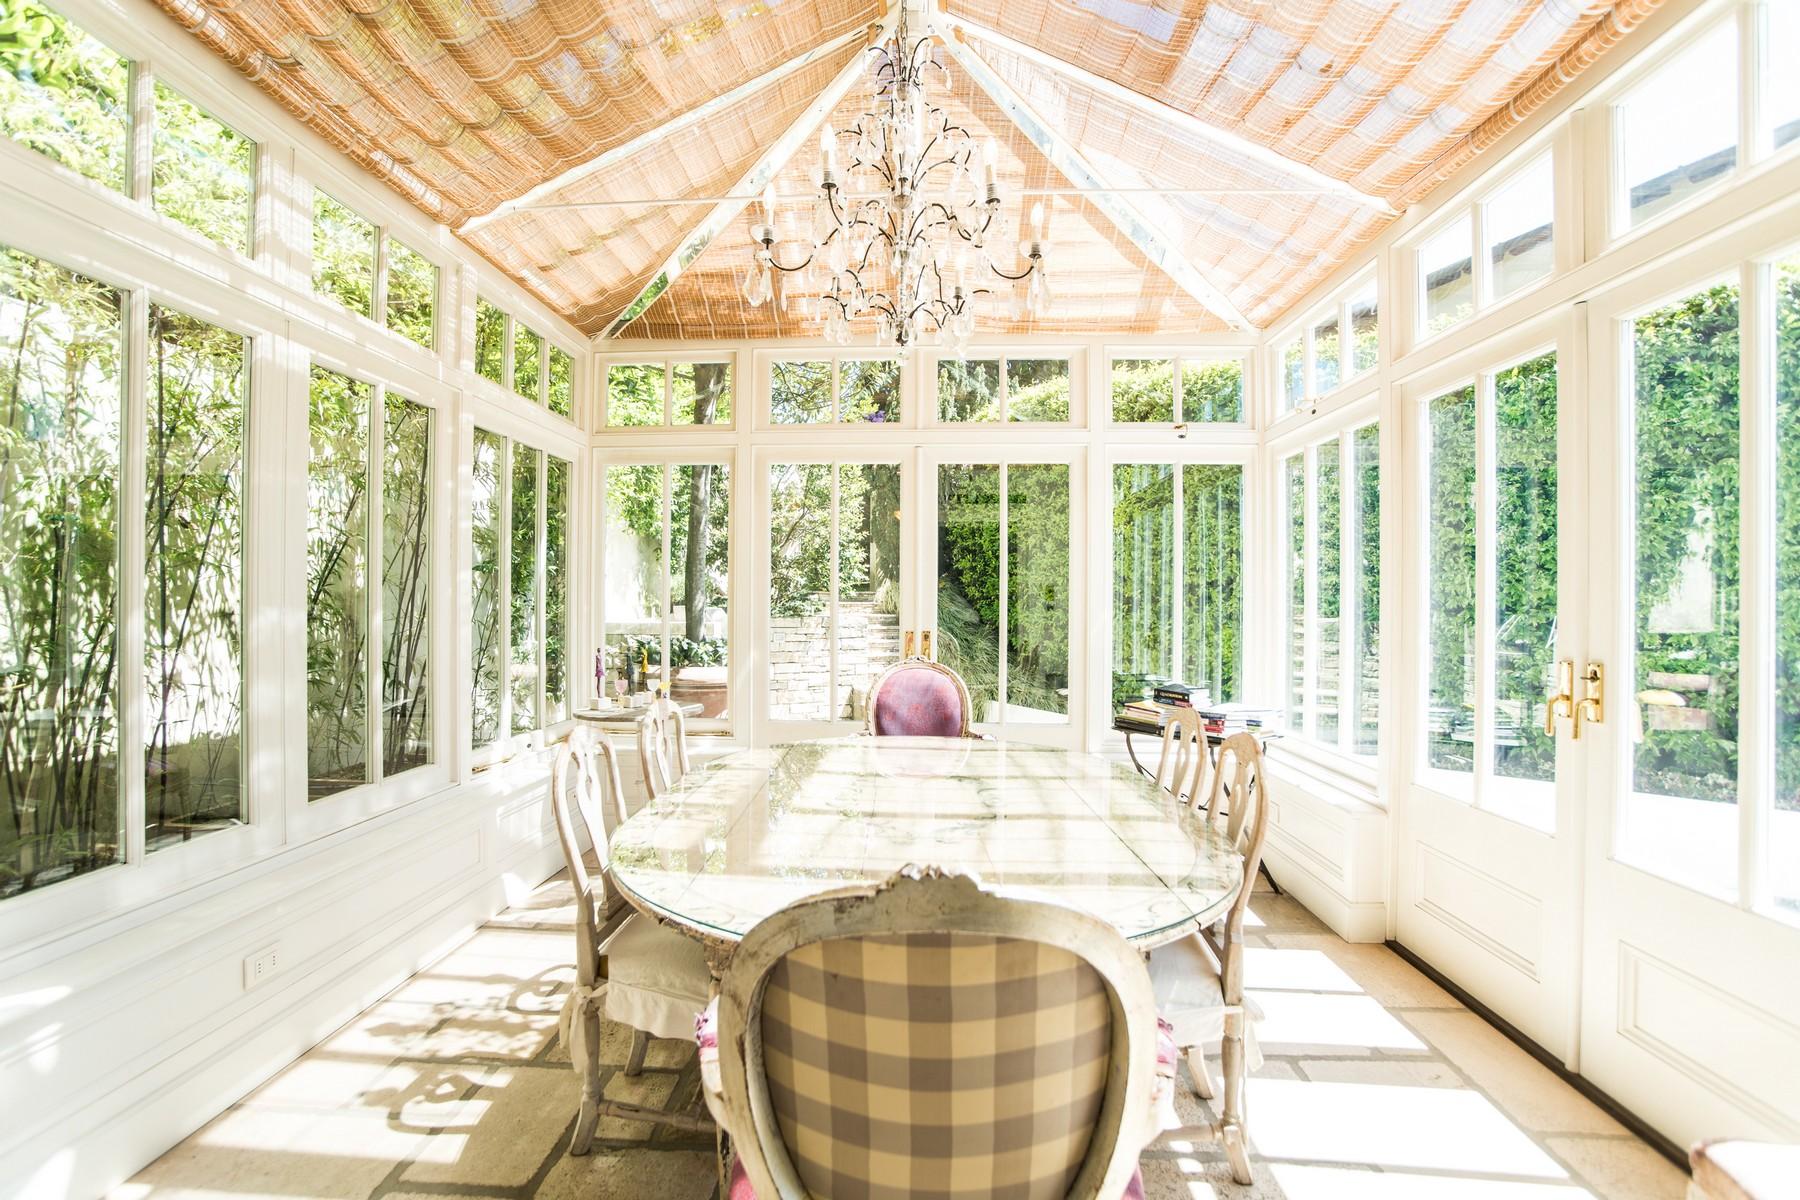 Additional photo for property listing at Gorgeous villa with dependance overlooking Lake Como Via Vittorio Veneto Cernobbio, Como 22012 Italia